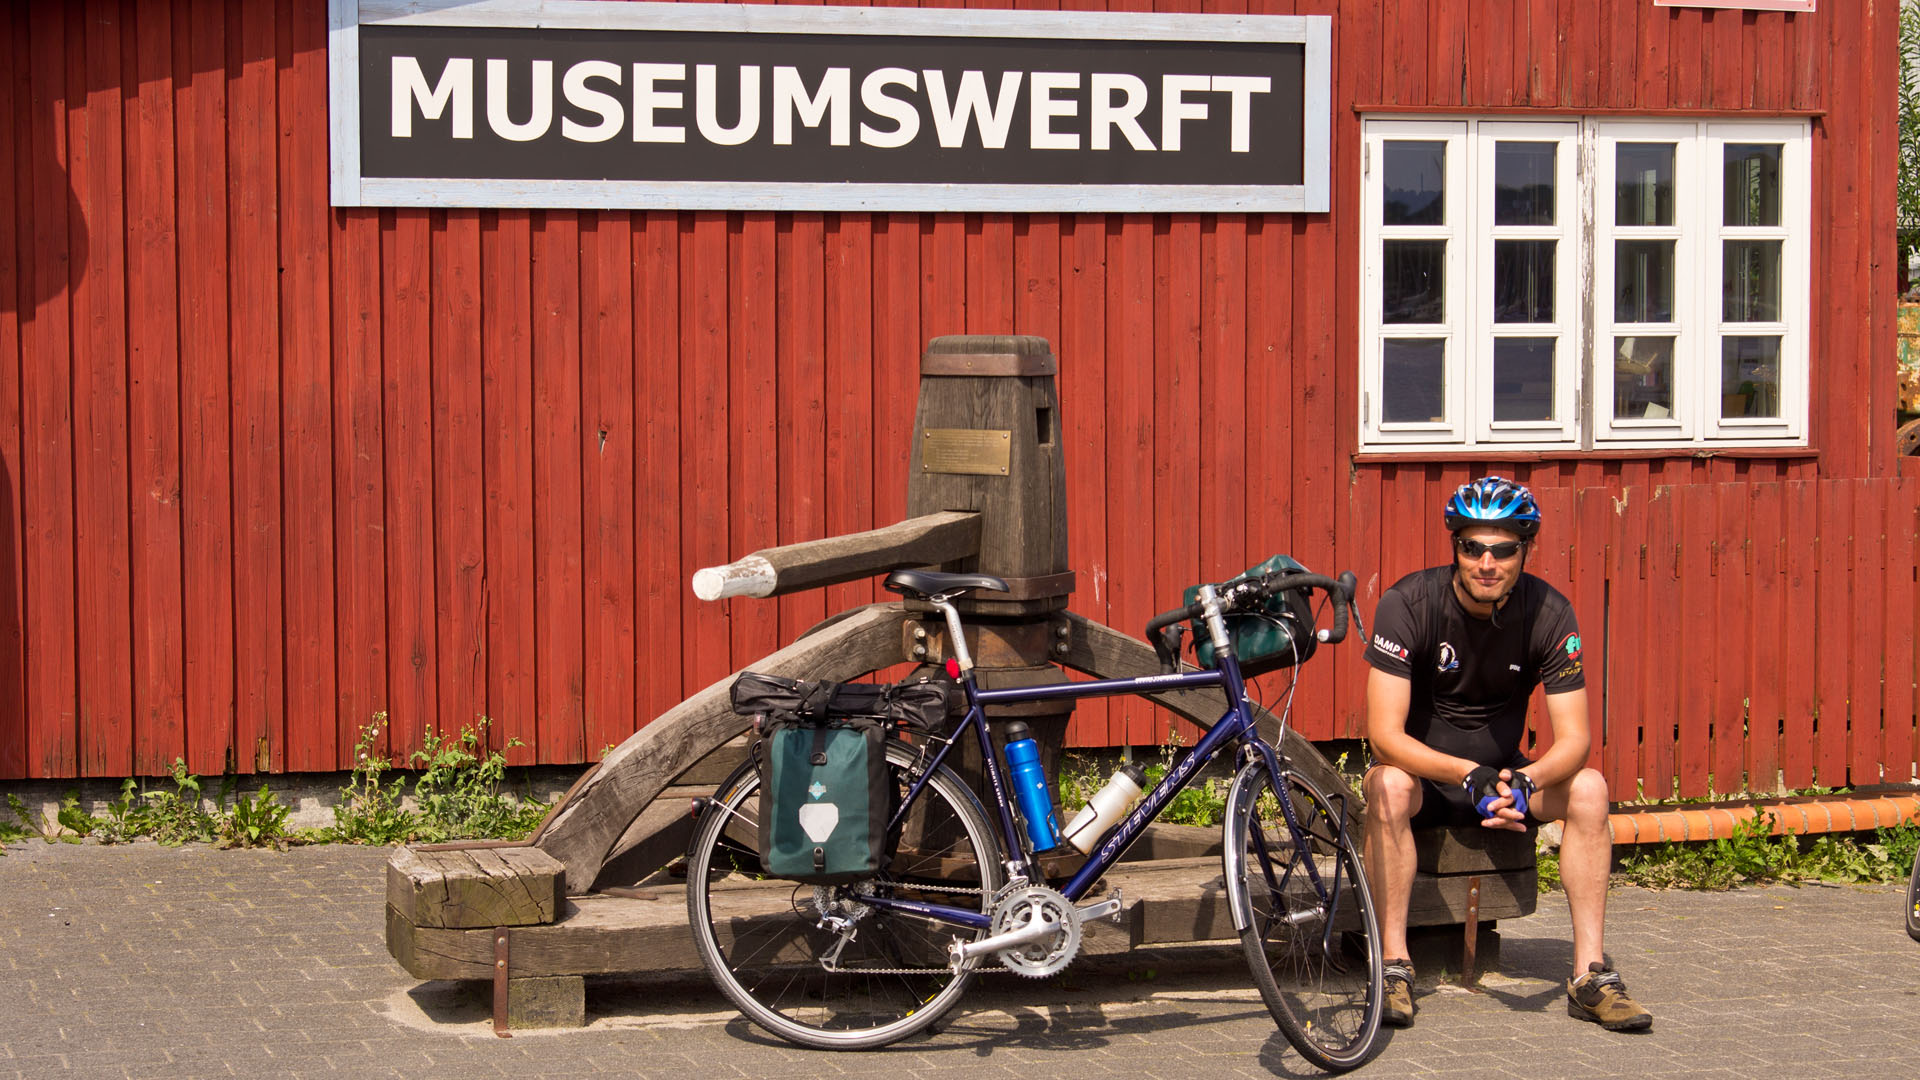 Flensburg Museumswerft